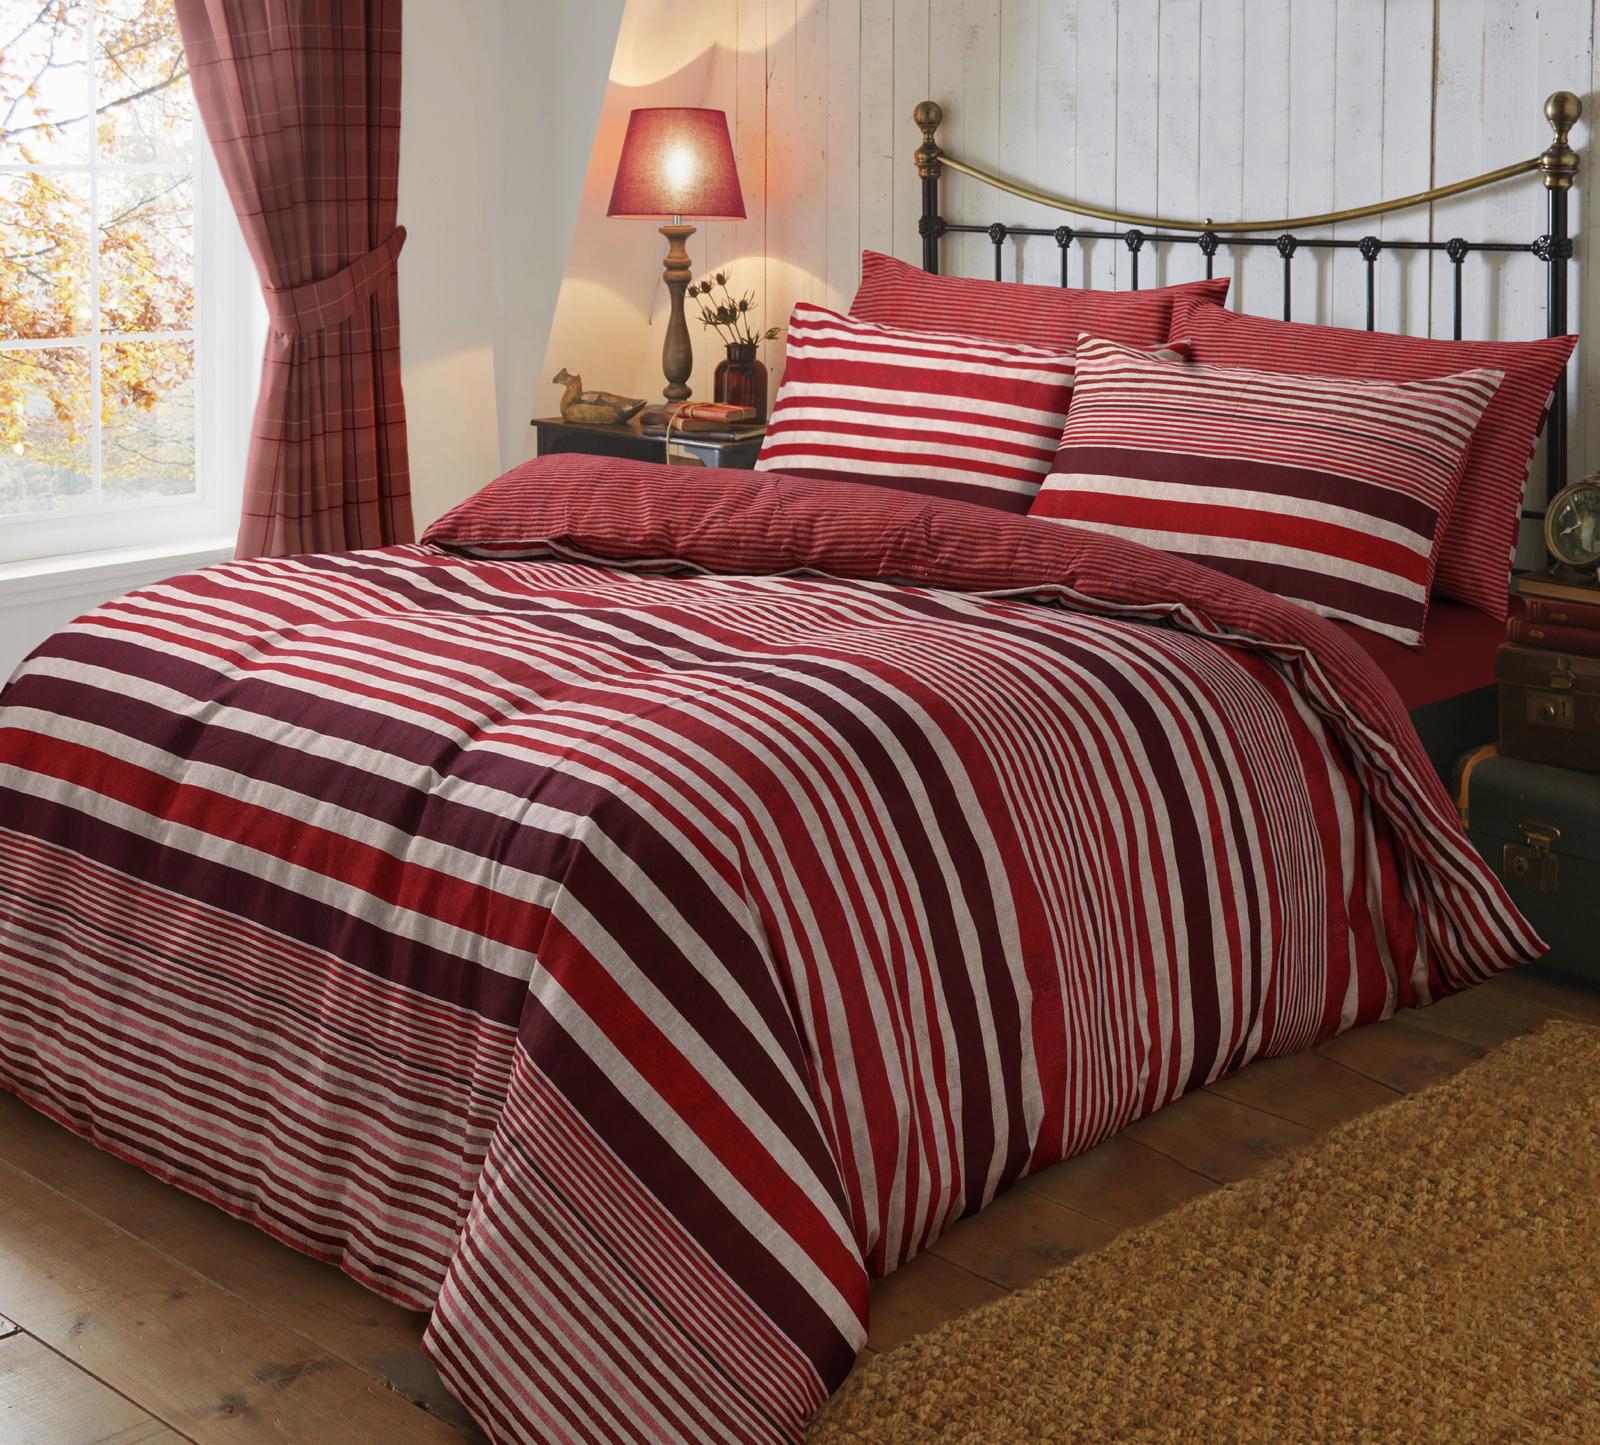 Flannel Stripe Duvet Cover Set Wholesale Bedding Store